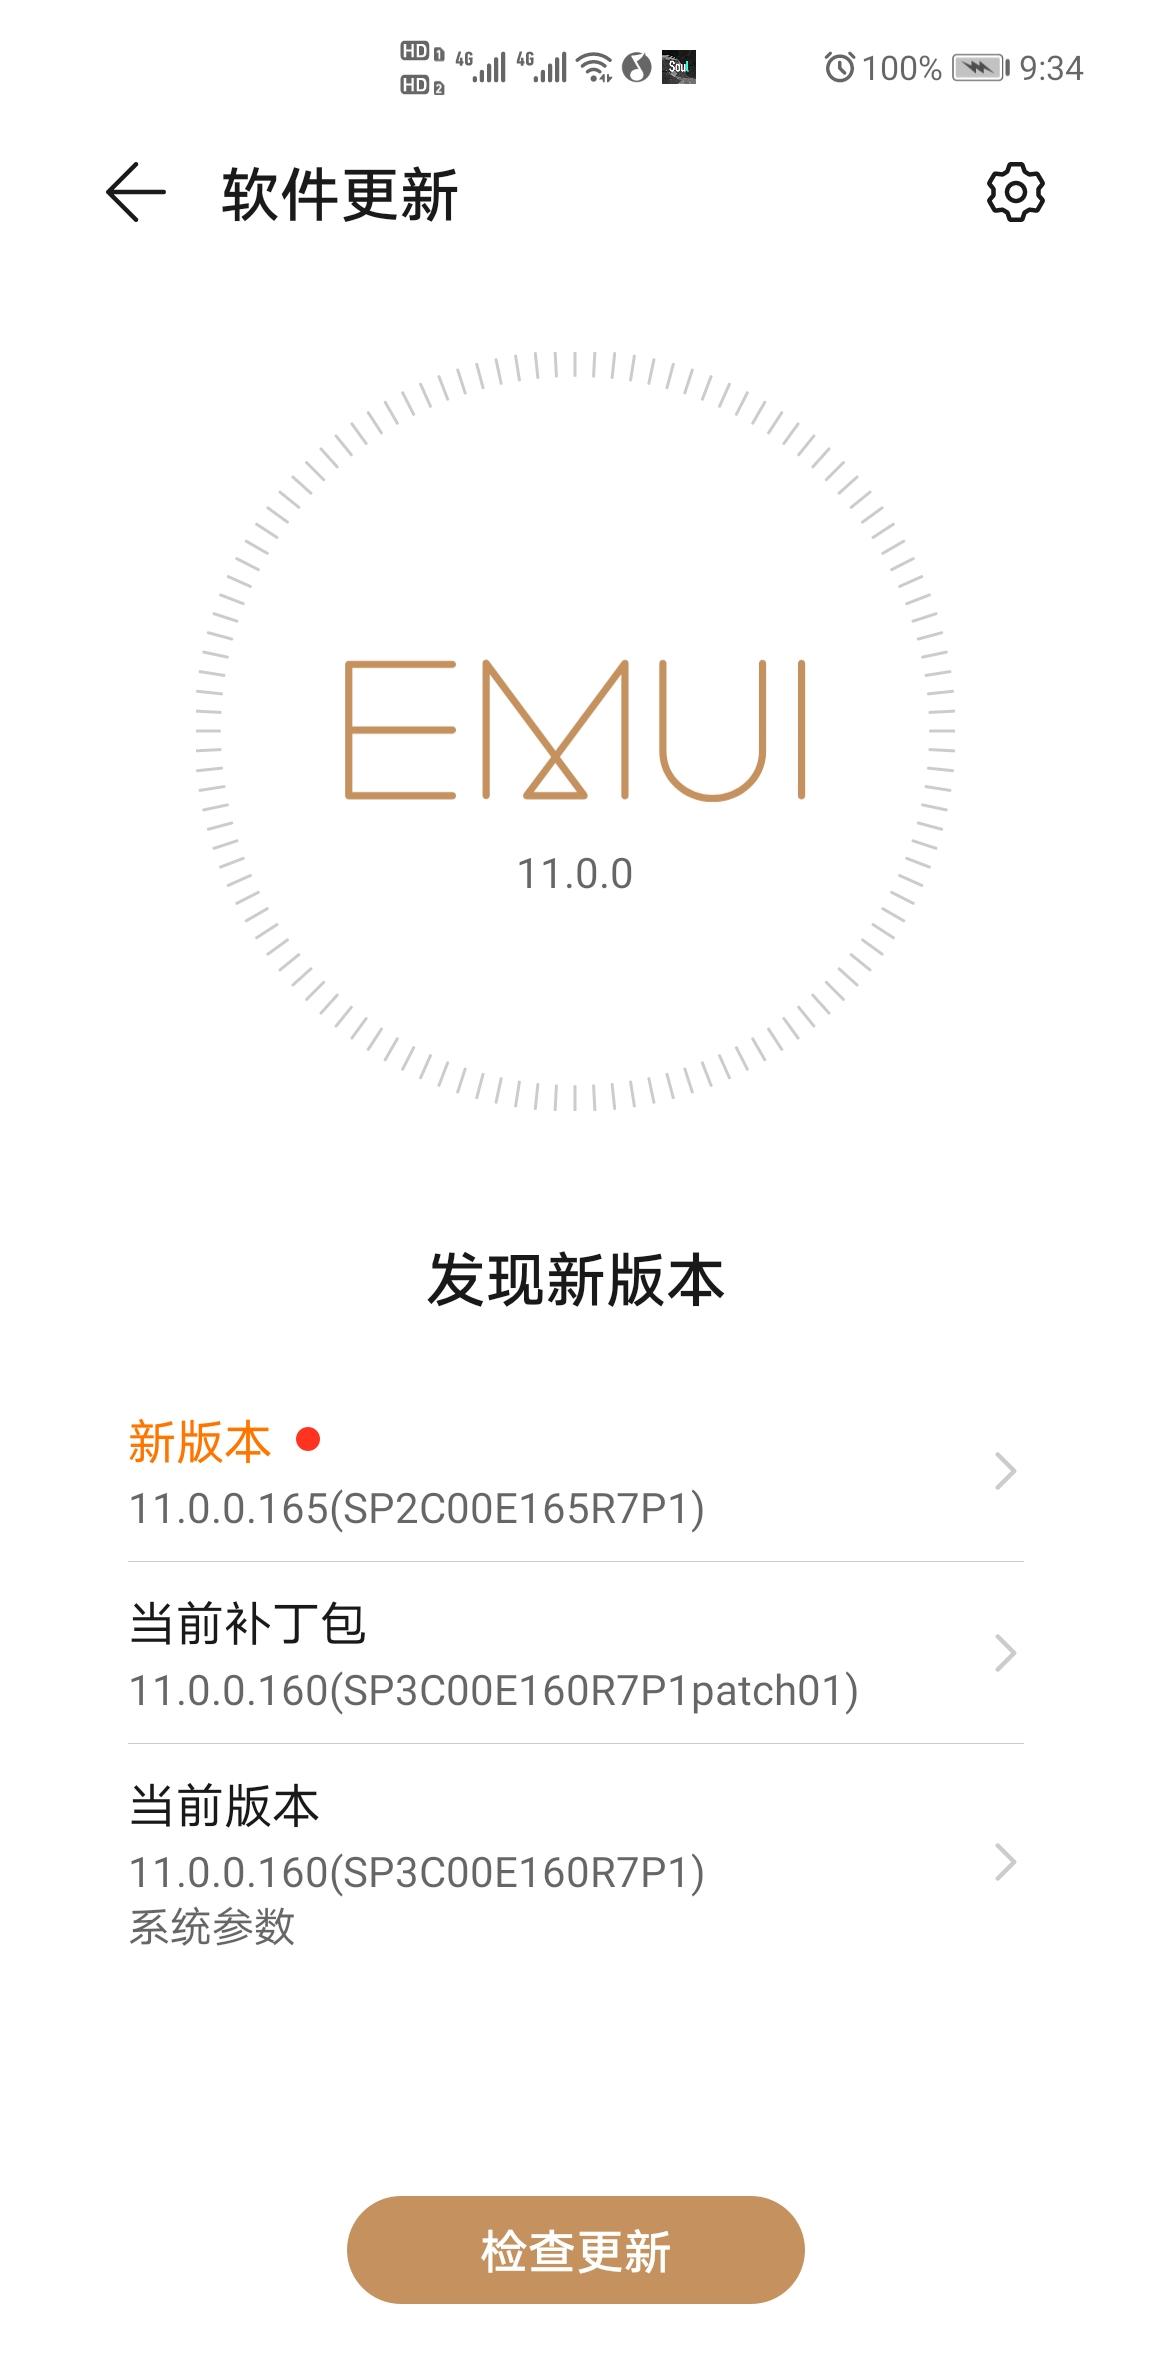 Screenshot_20210310_093448_com.huawei.android.hwouc.jpg